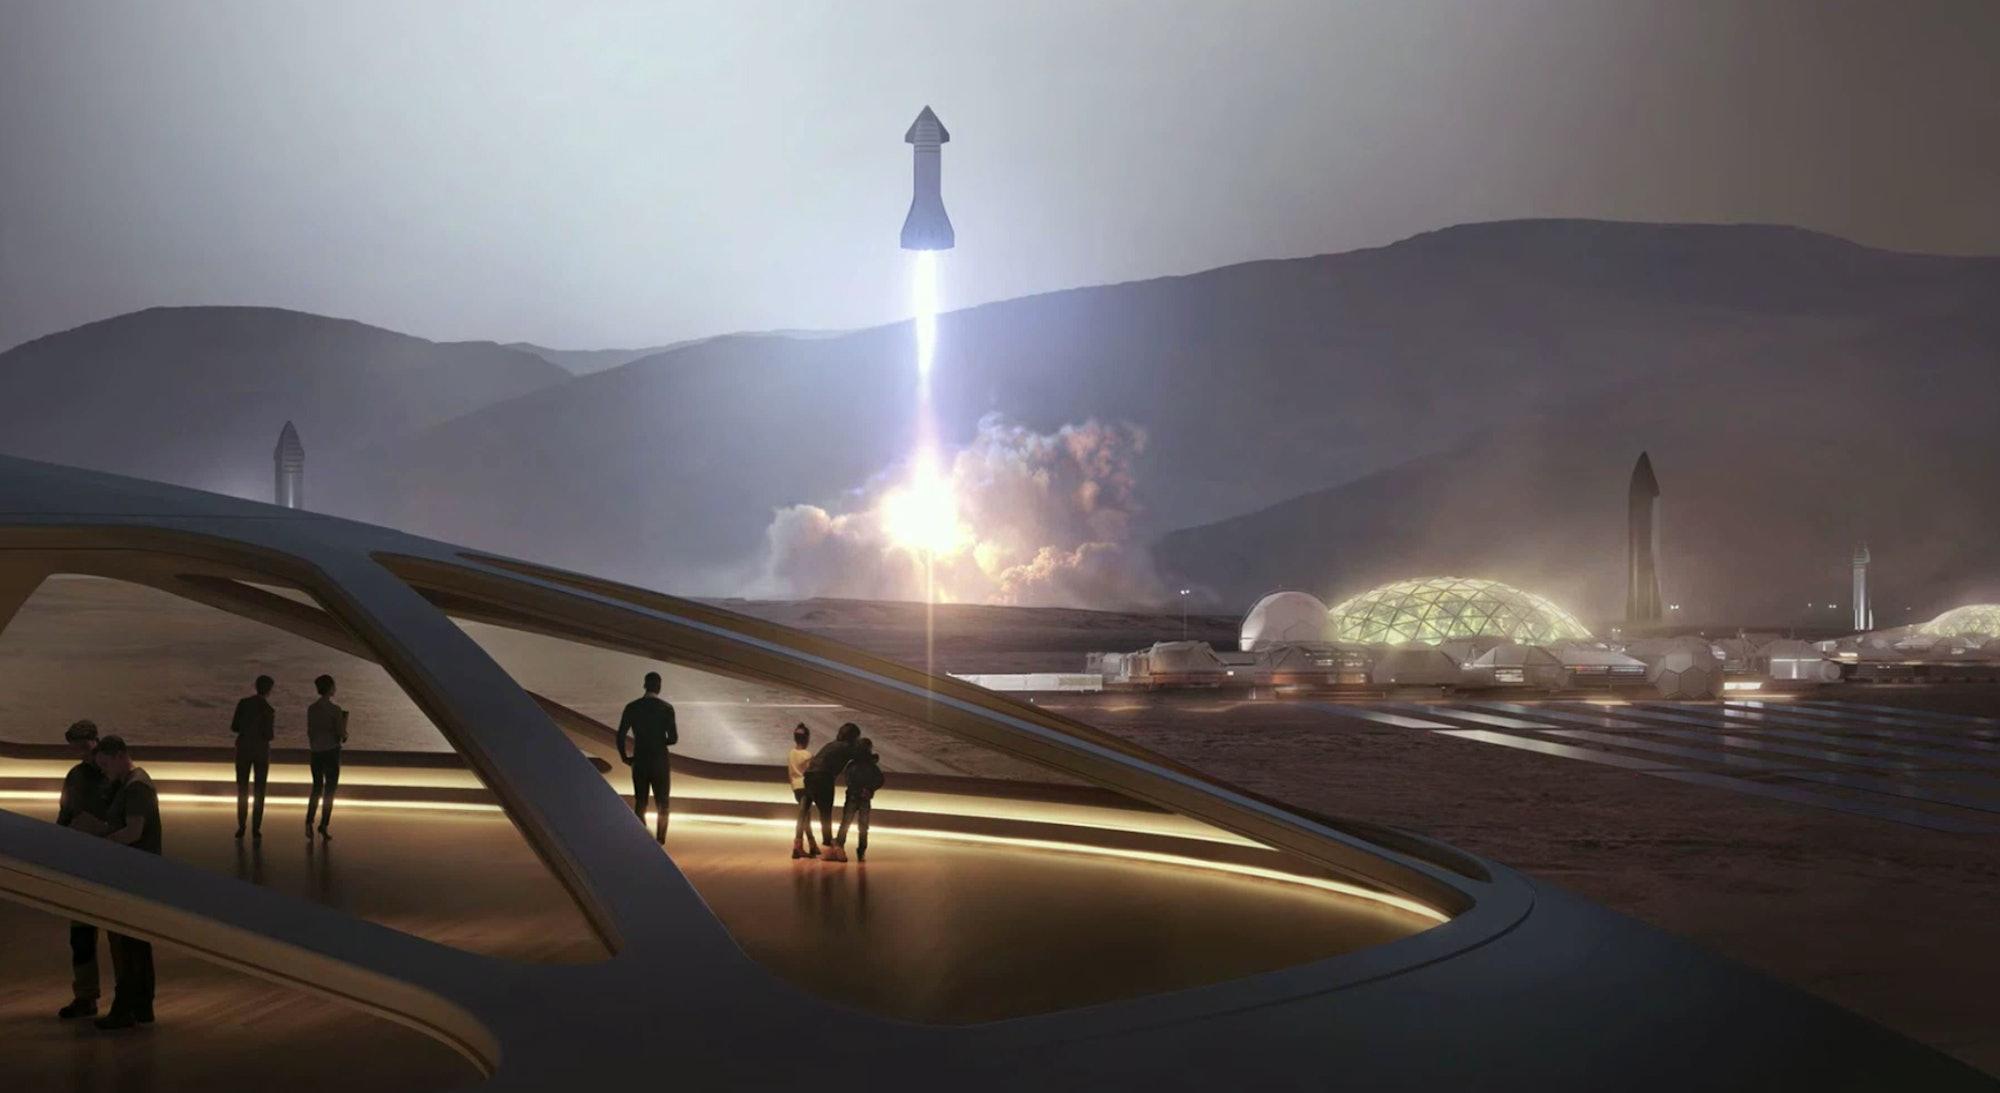 The Starship landing on Mars.